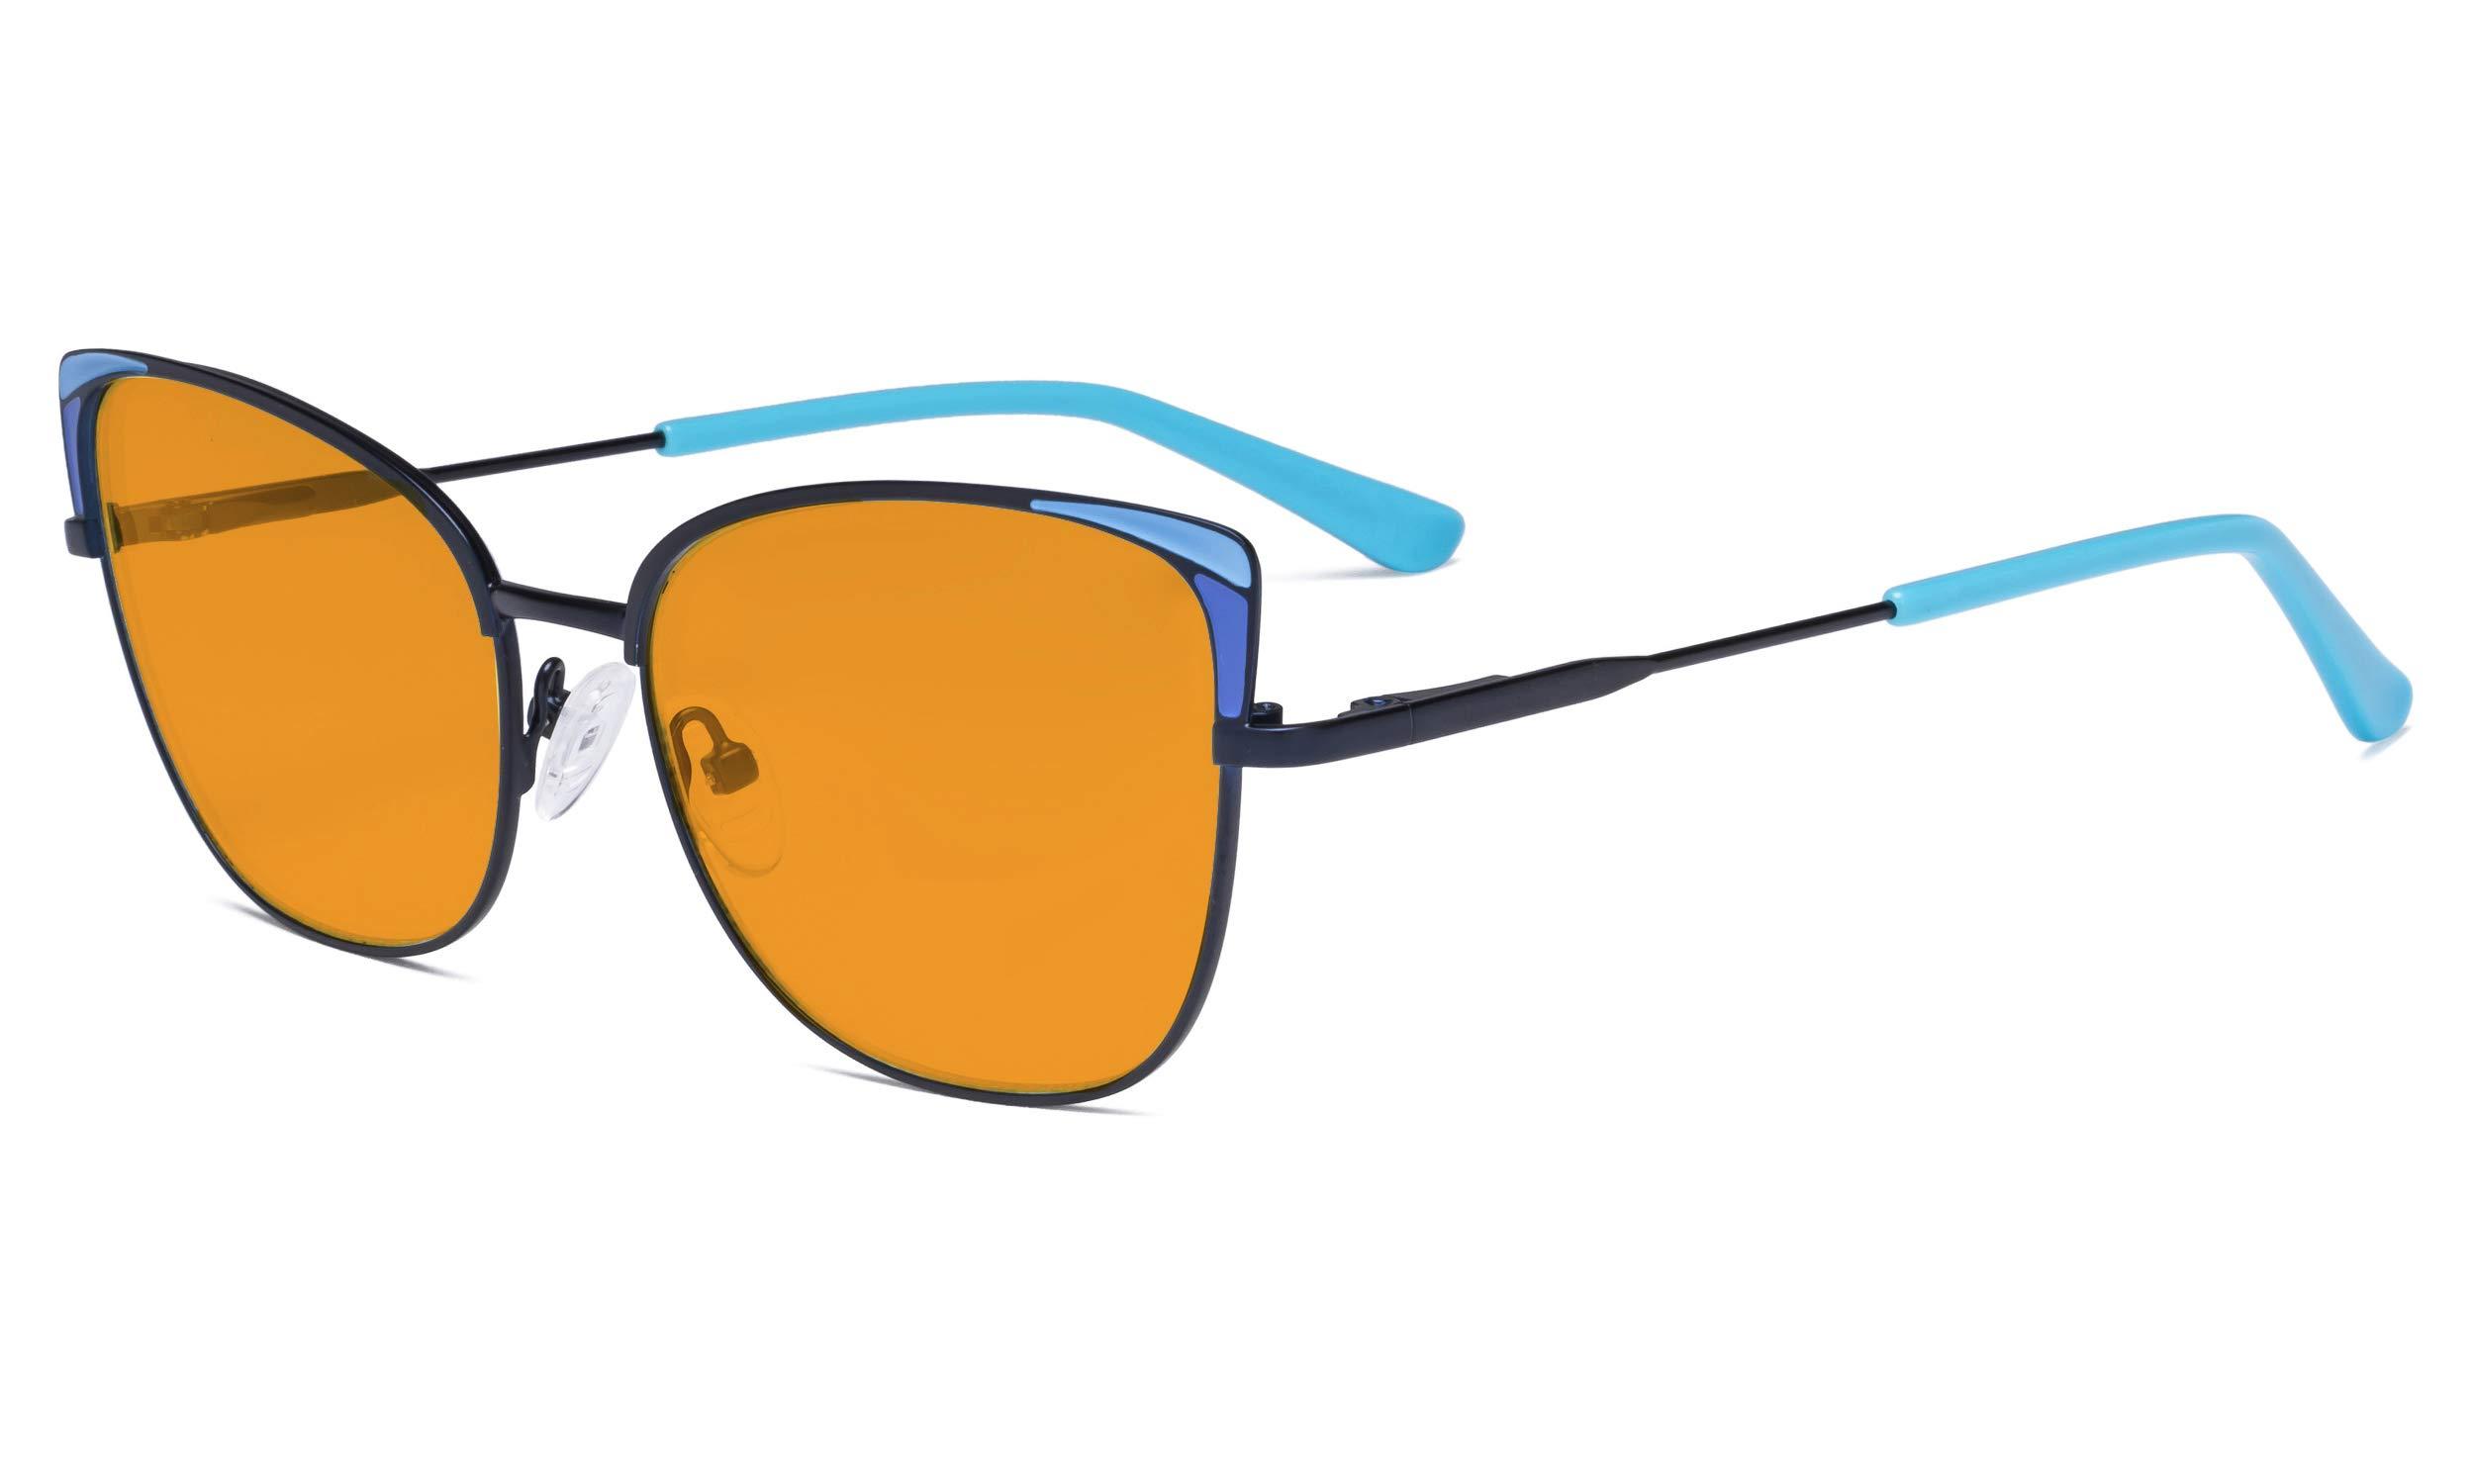 Eyekepper Ladies Oversized Blue Light Blocking Glasses - Butterfly Design Computer Eyegalsses Women Anti Screen UV Rays - Cut Digital Glare Filter Reduce Eye Strain Orange Tinted Filter - Blue